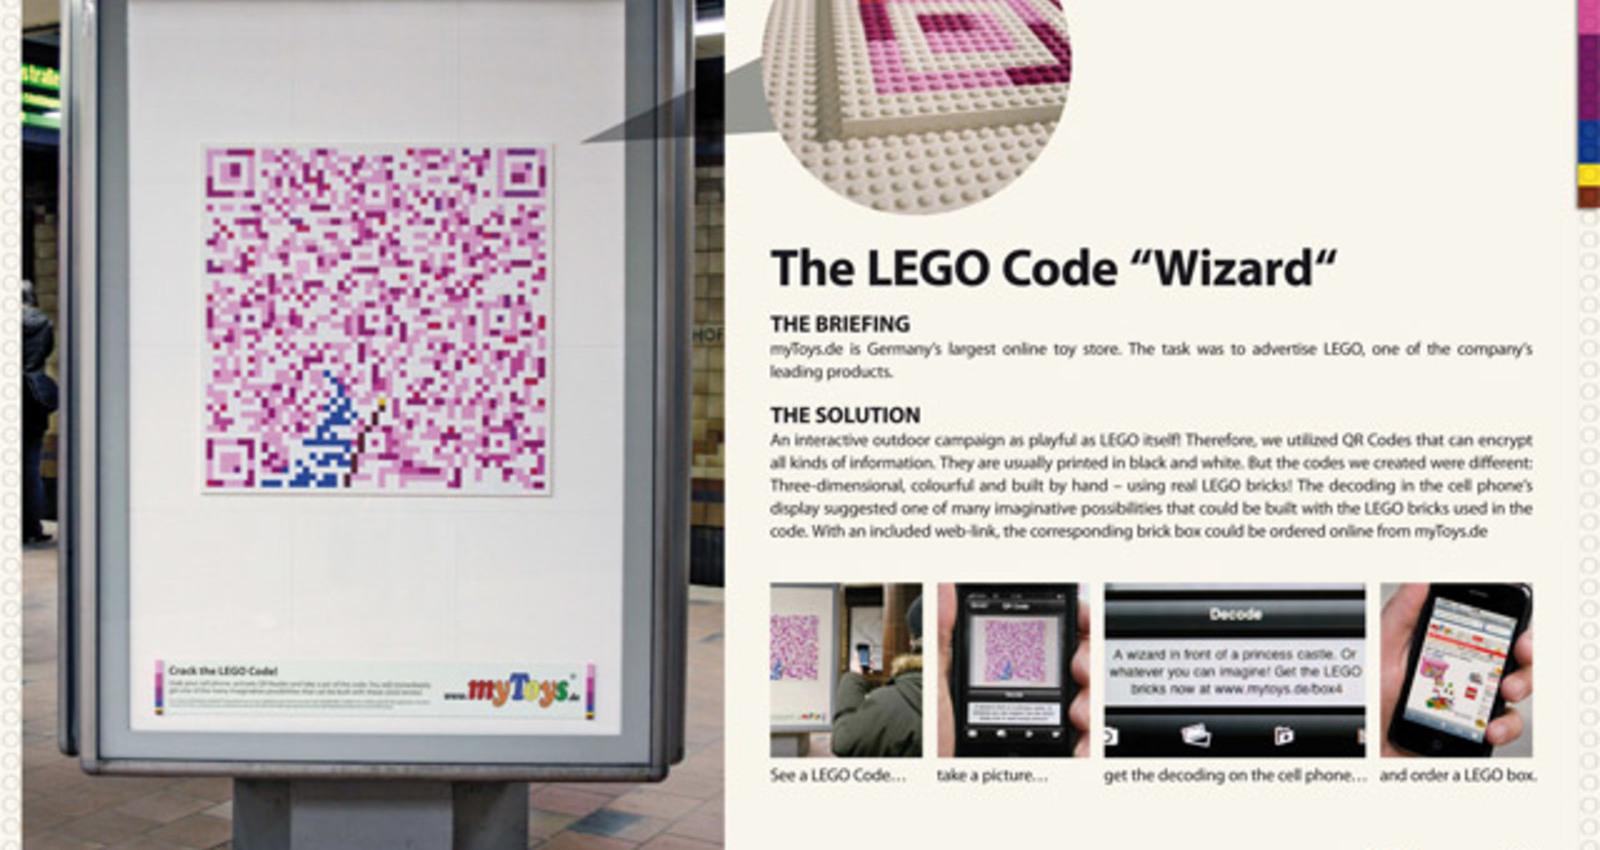 The LEGO Codes